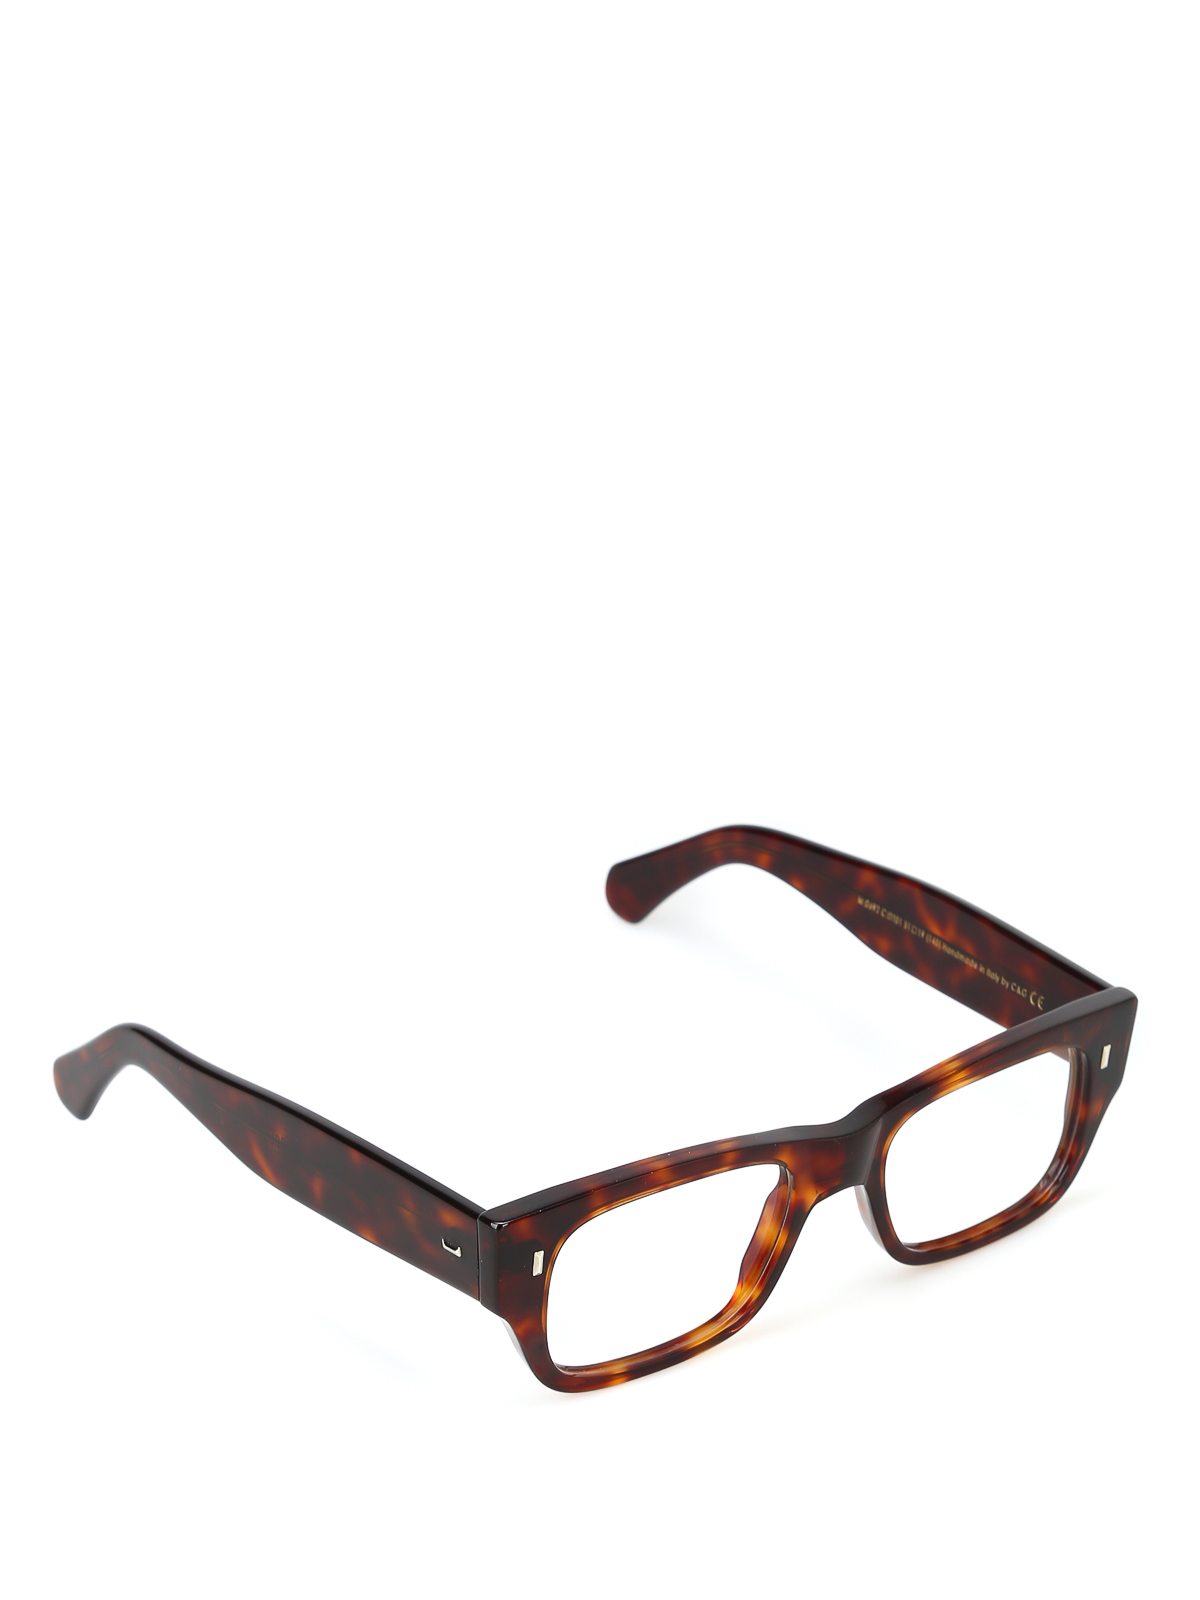 25aa05cbb59 Cutler And Gross - Flattened thick tortoise frame glasses - glasses ...